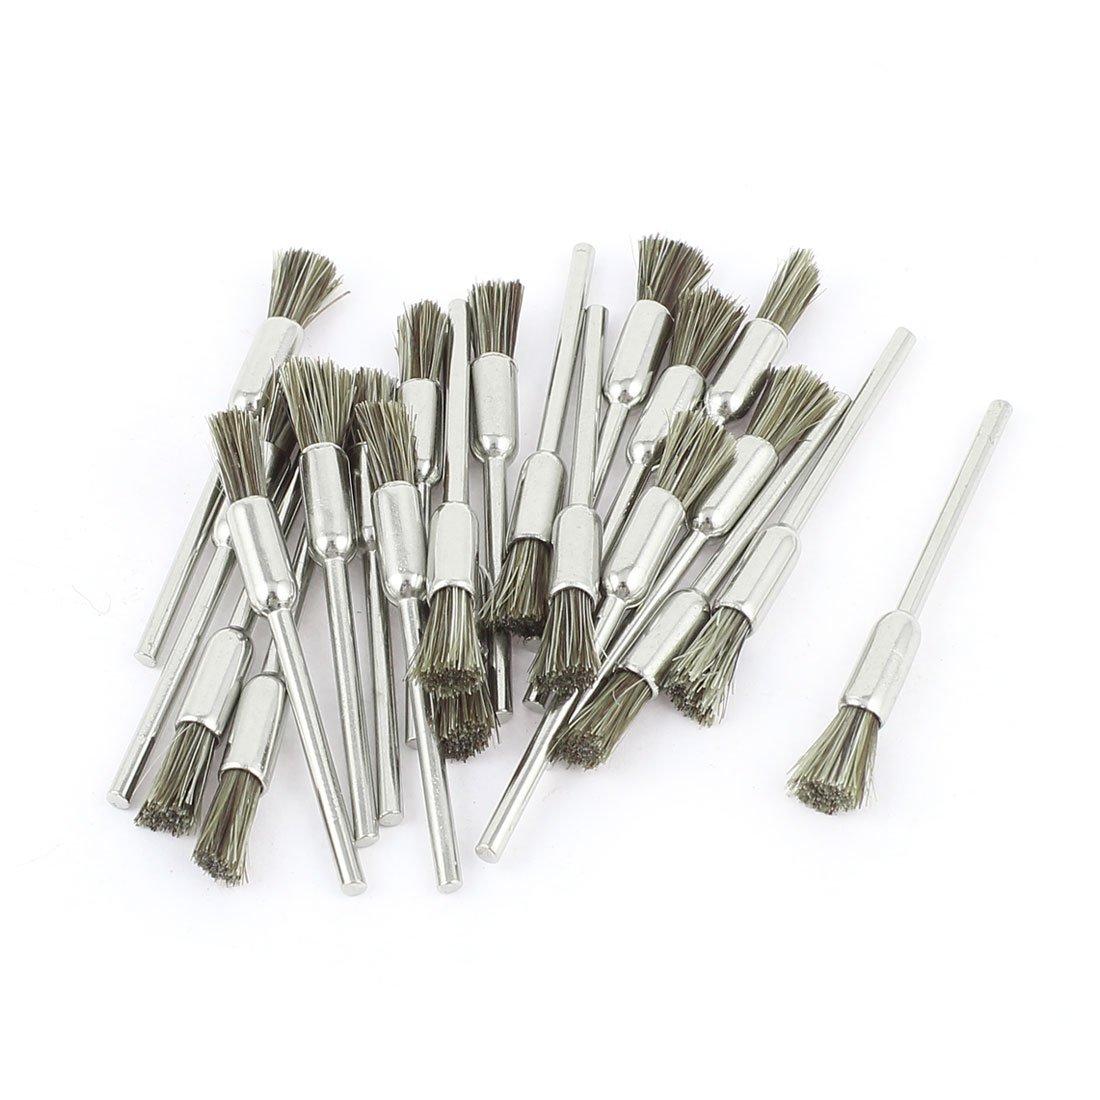 2/32 Inch Mandrel Brown Bristle Pen Polishing Brush 22 Pcs for Dremel Sourcingmap SYNCELEC000472